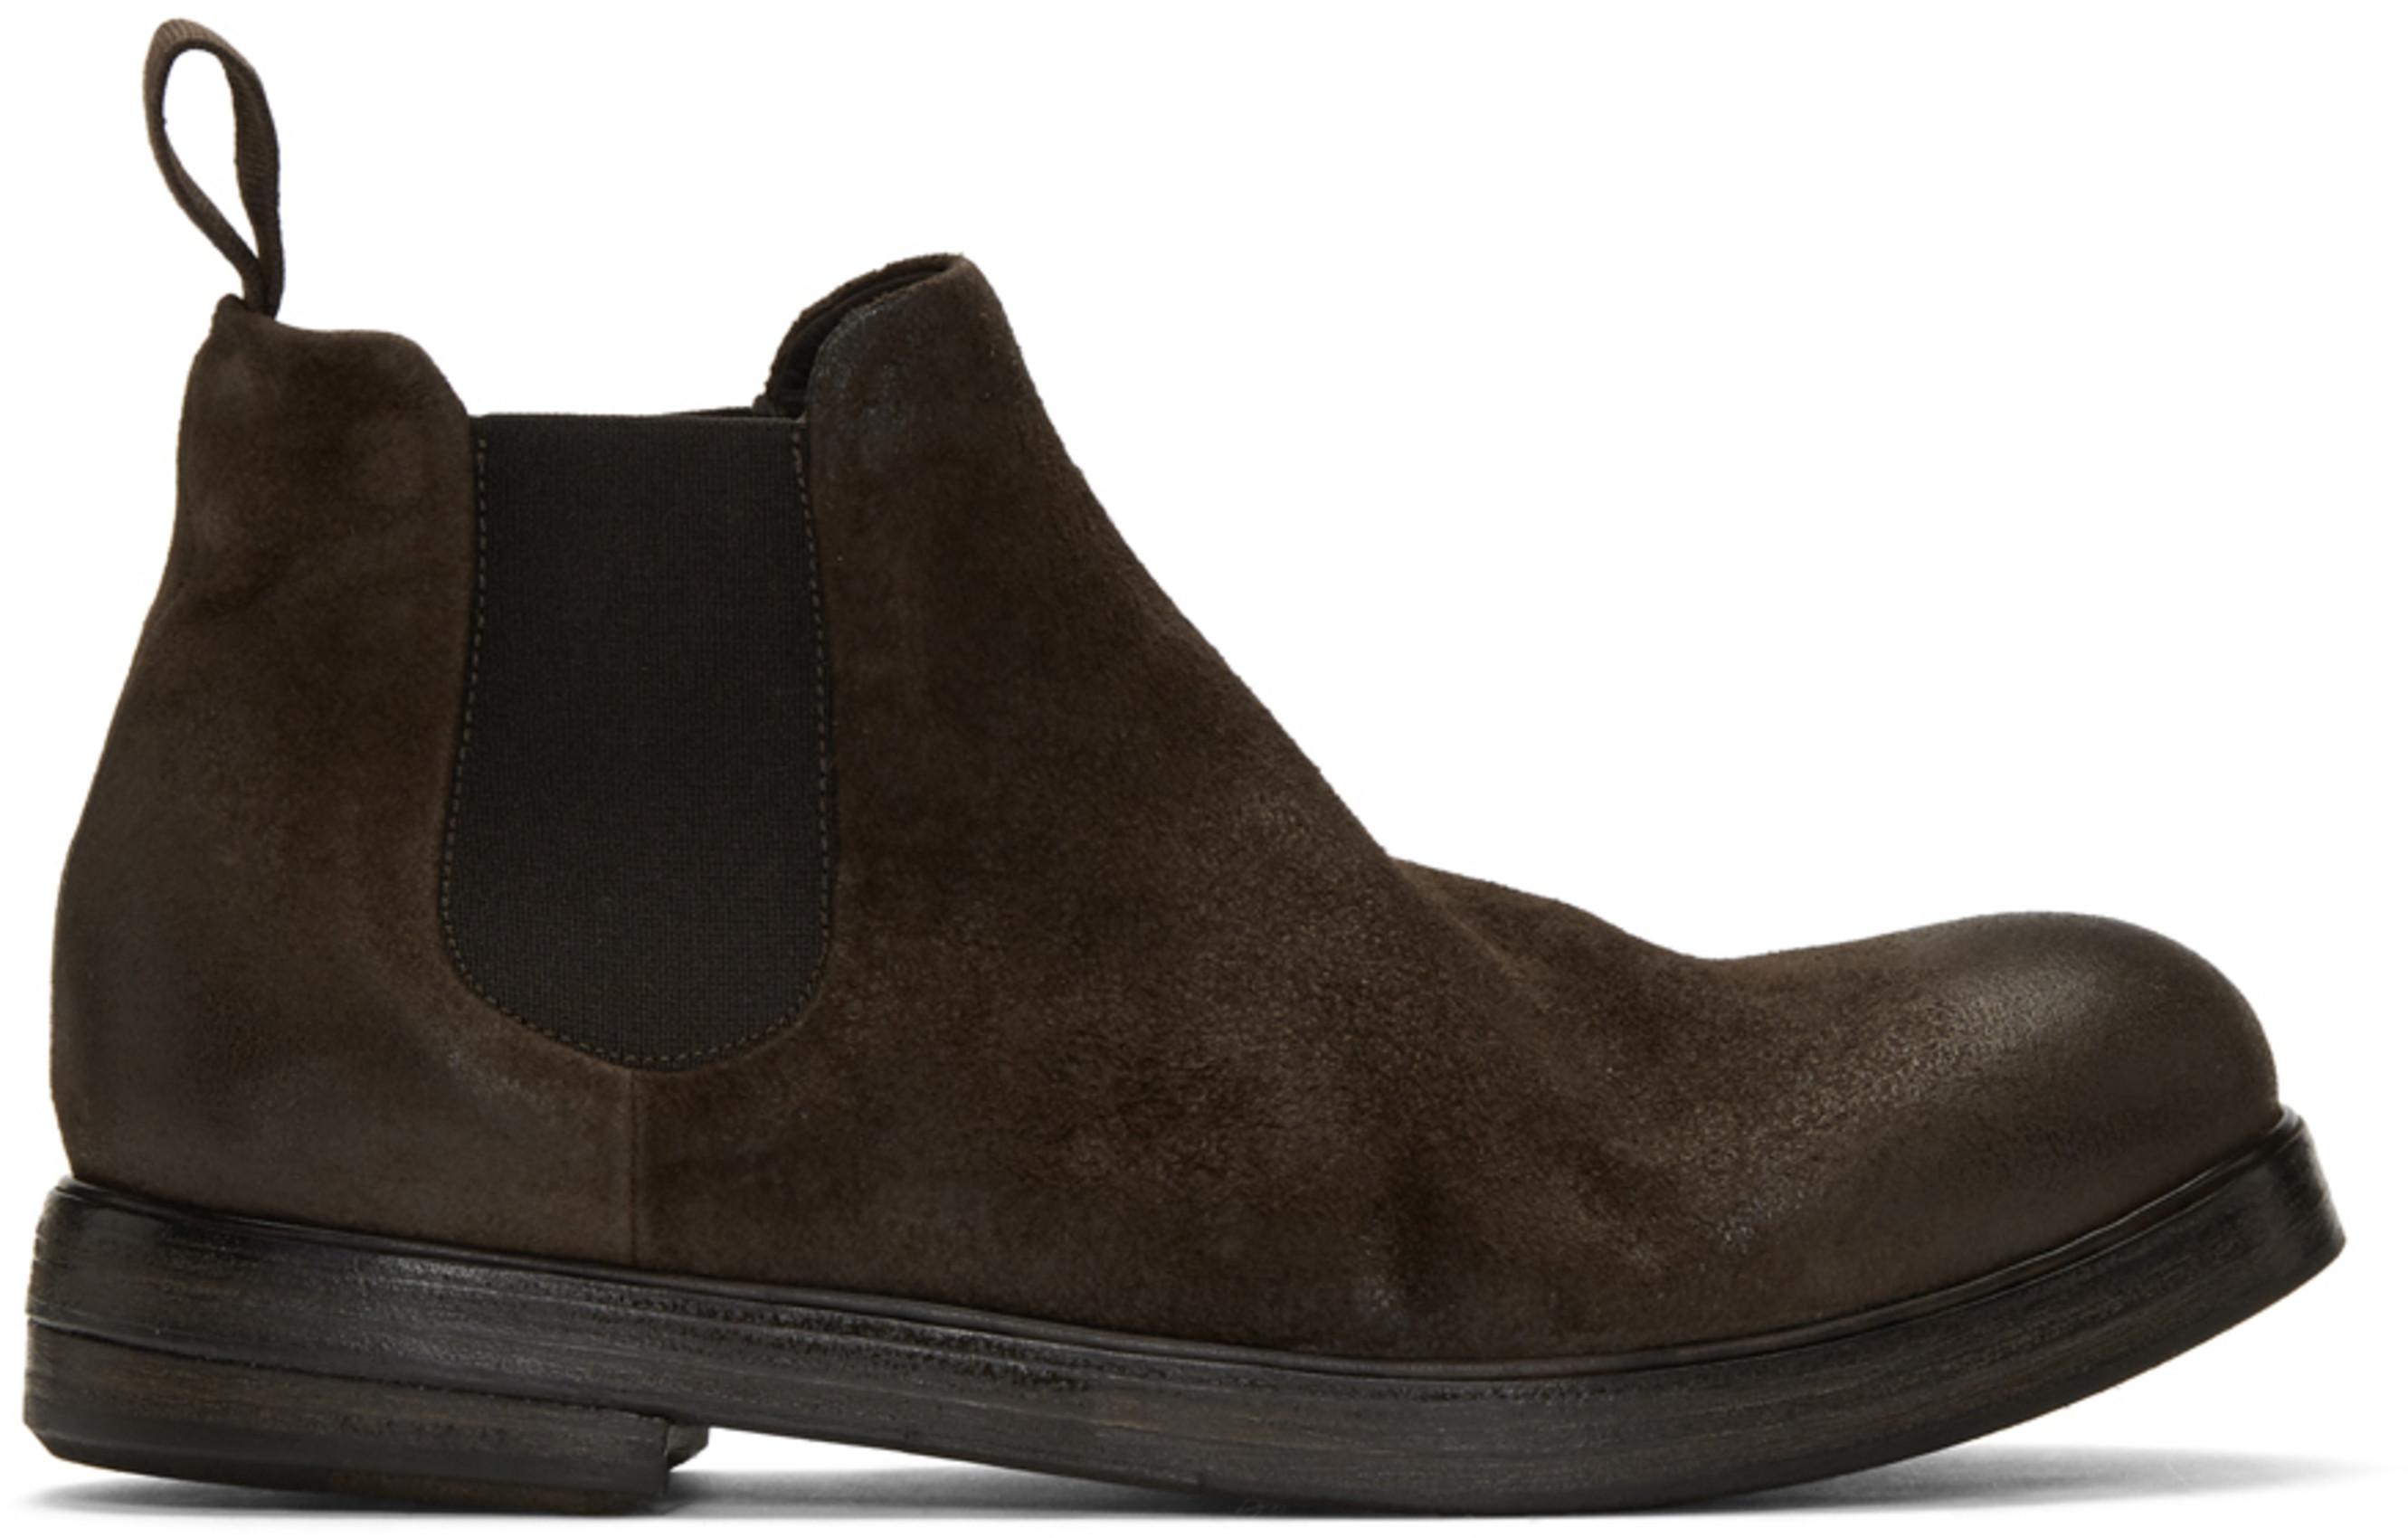 b70a60ef9ff Brown Suede Zucca Zeppa Beatles Chelsea Boots